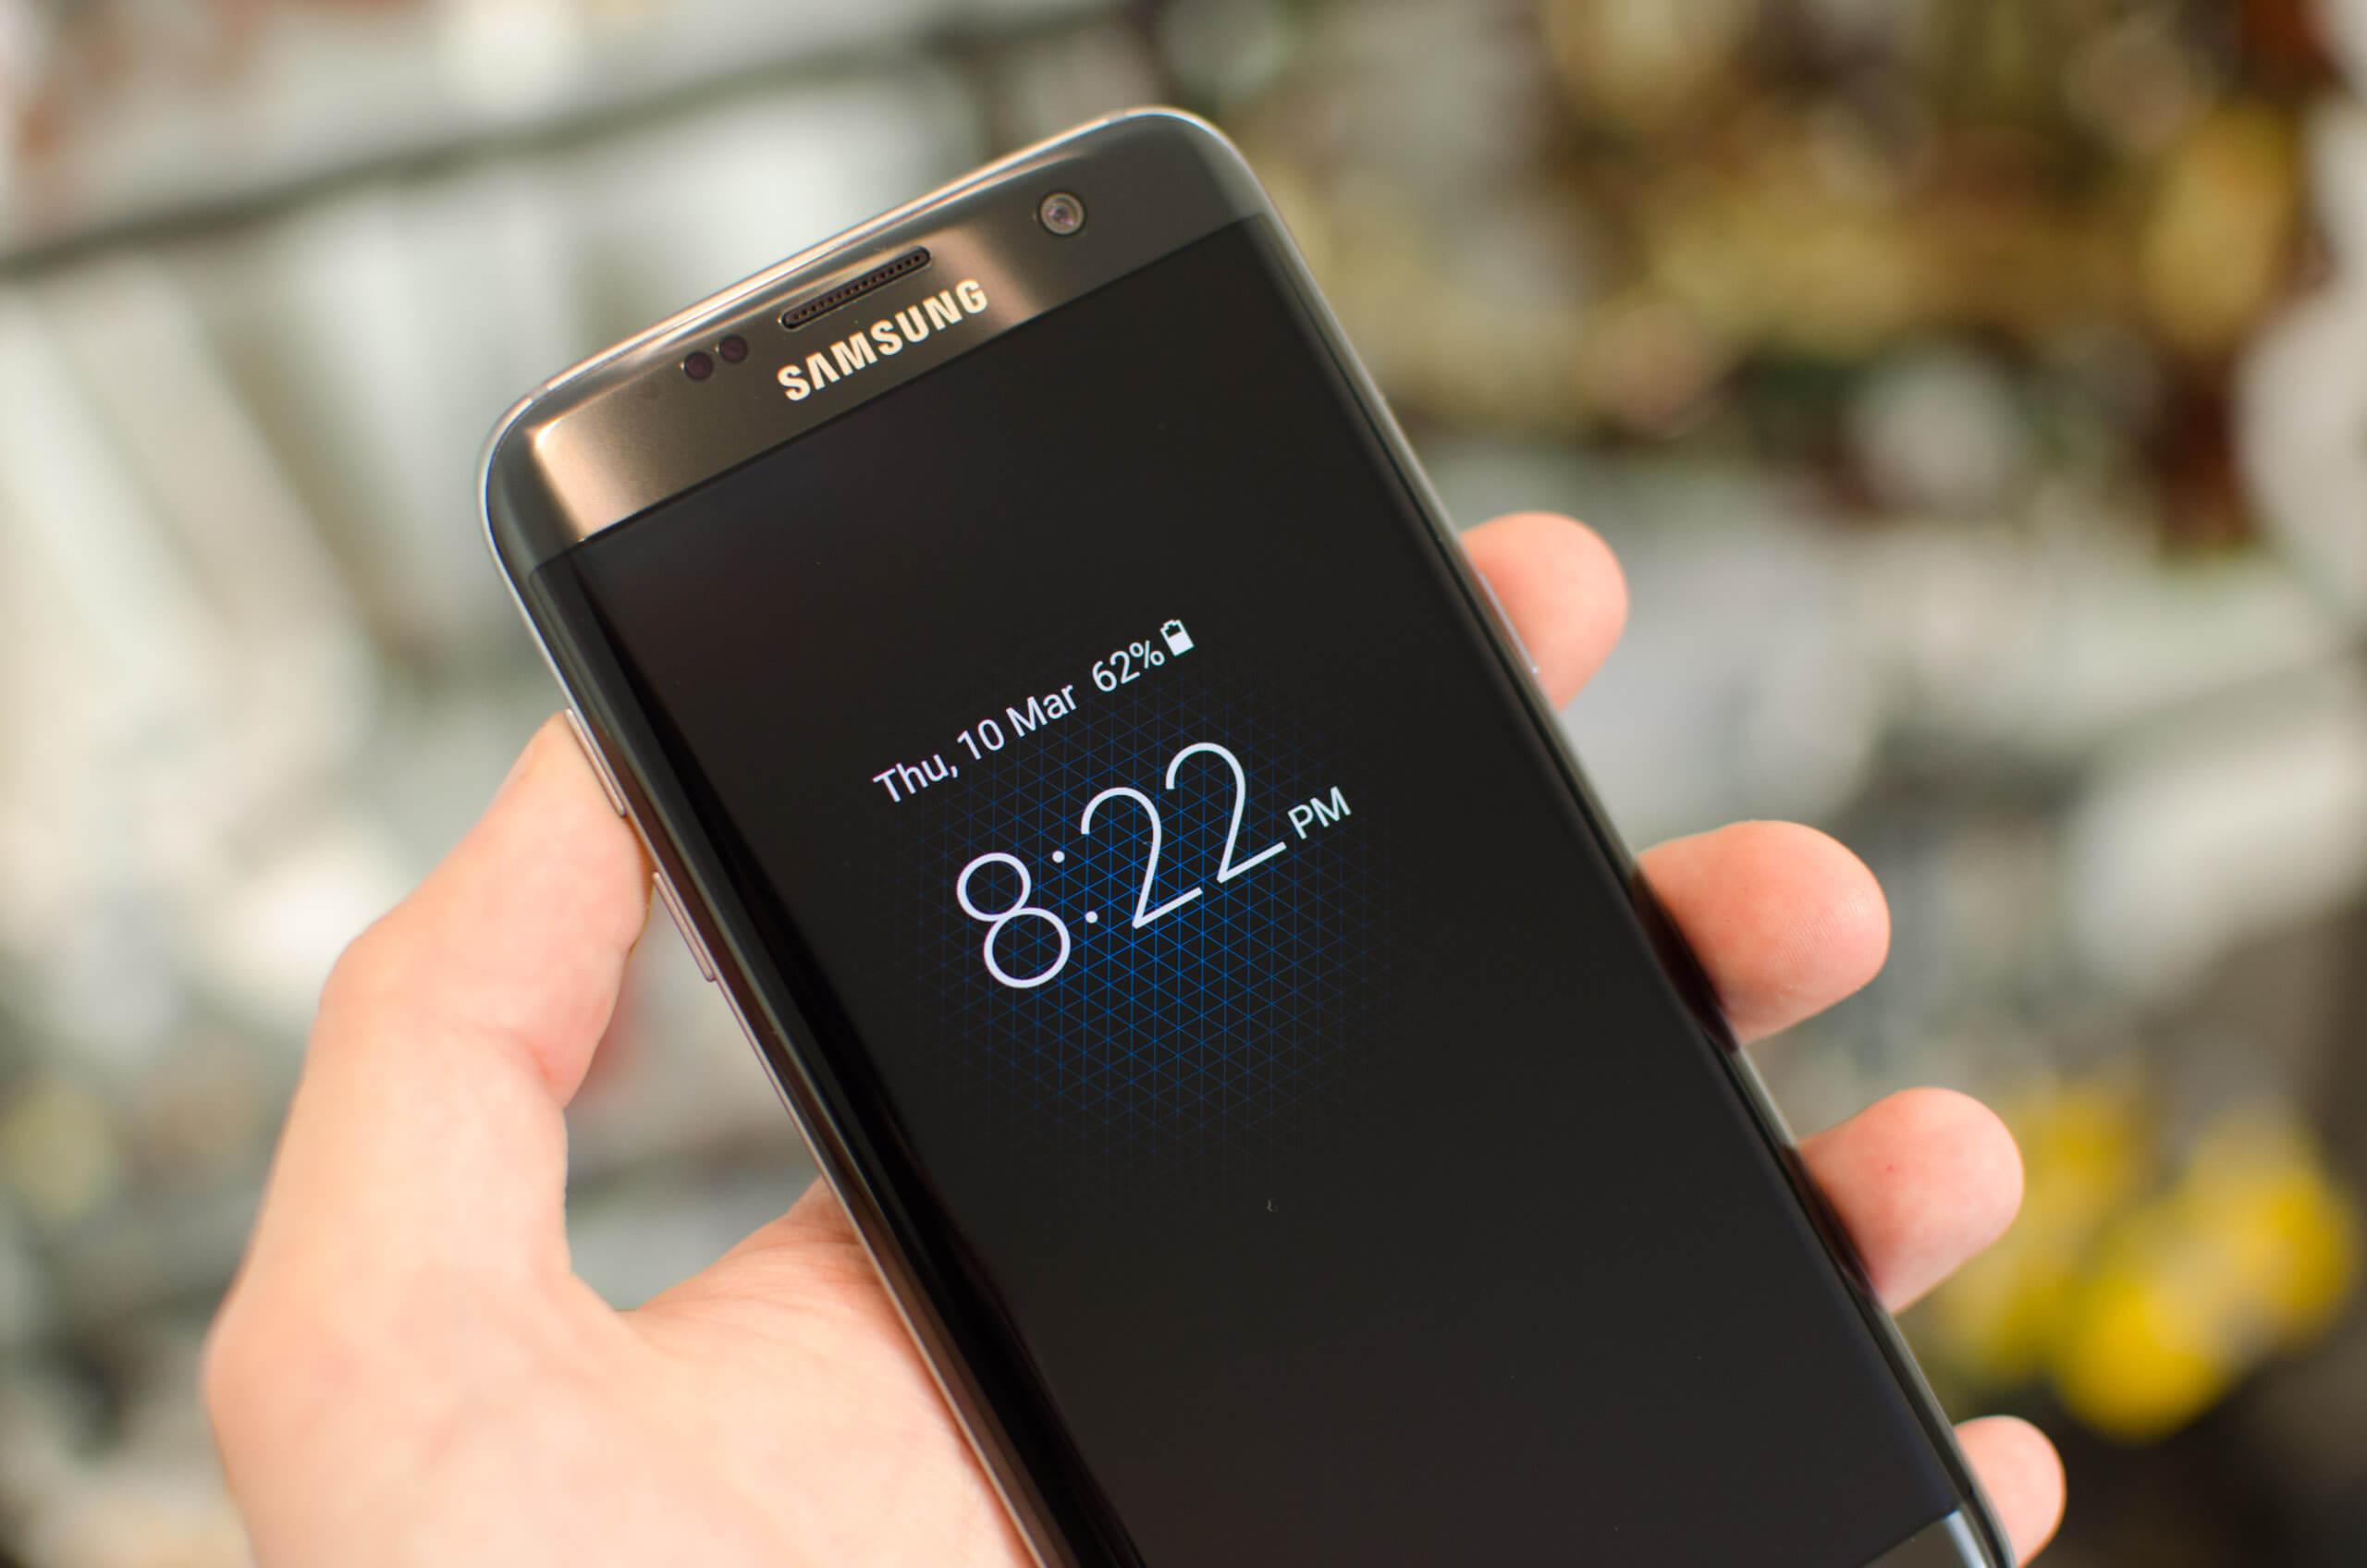 Samsung-ek ClockFace-n gai berriak gehitu ditu!